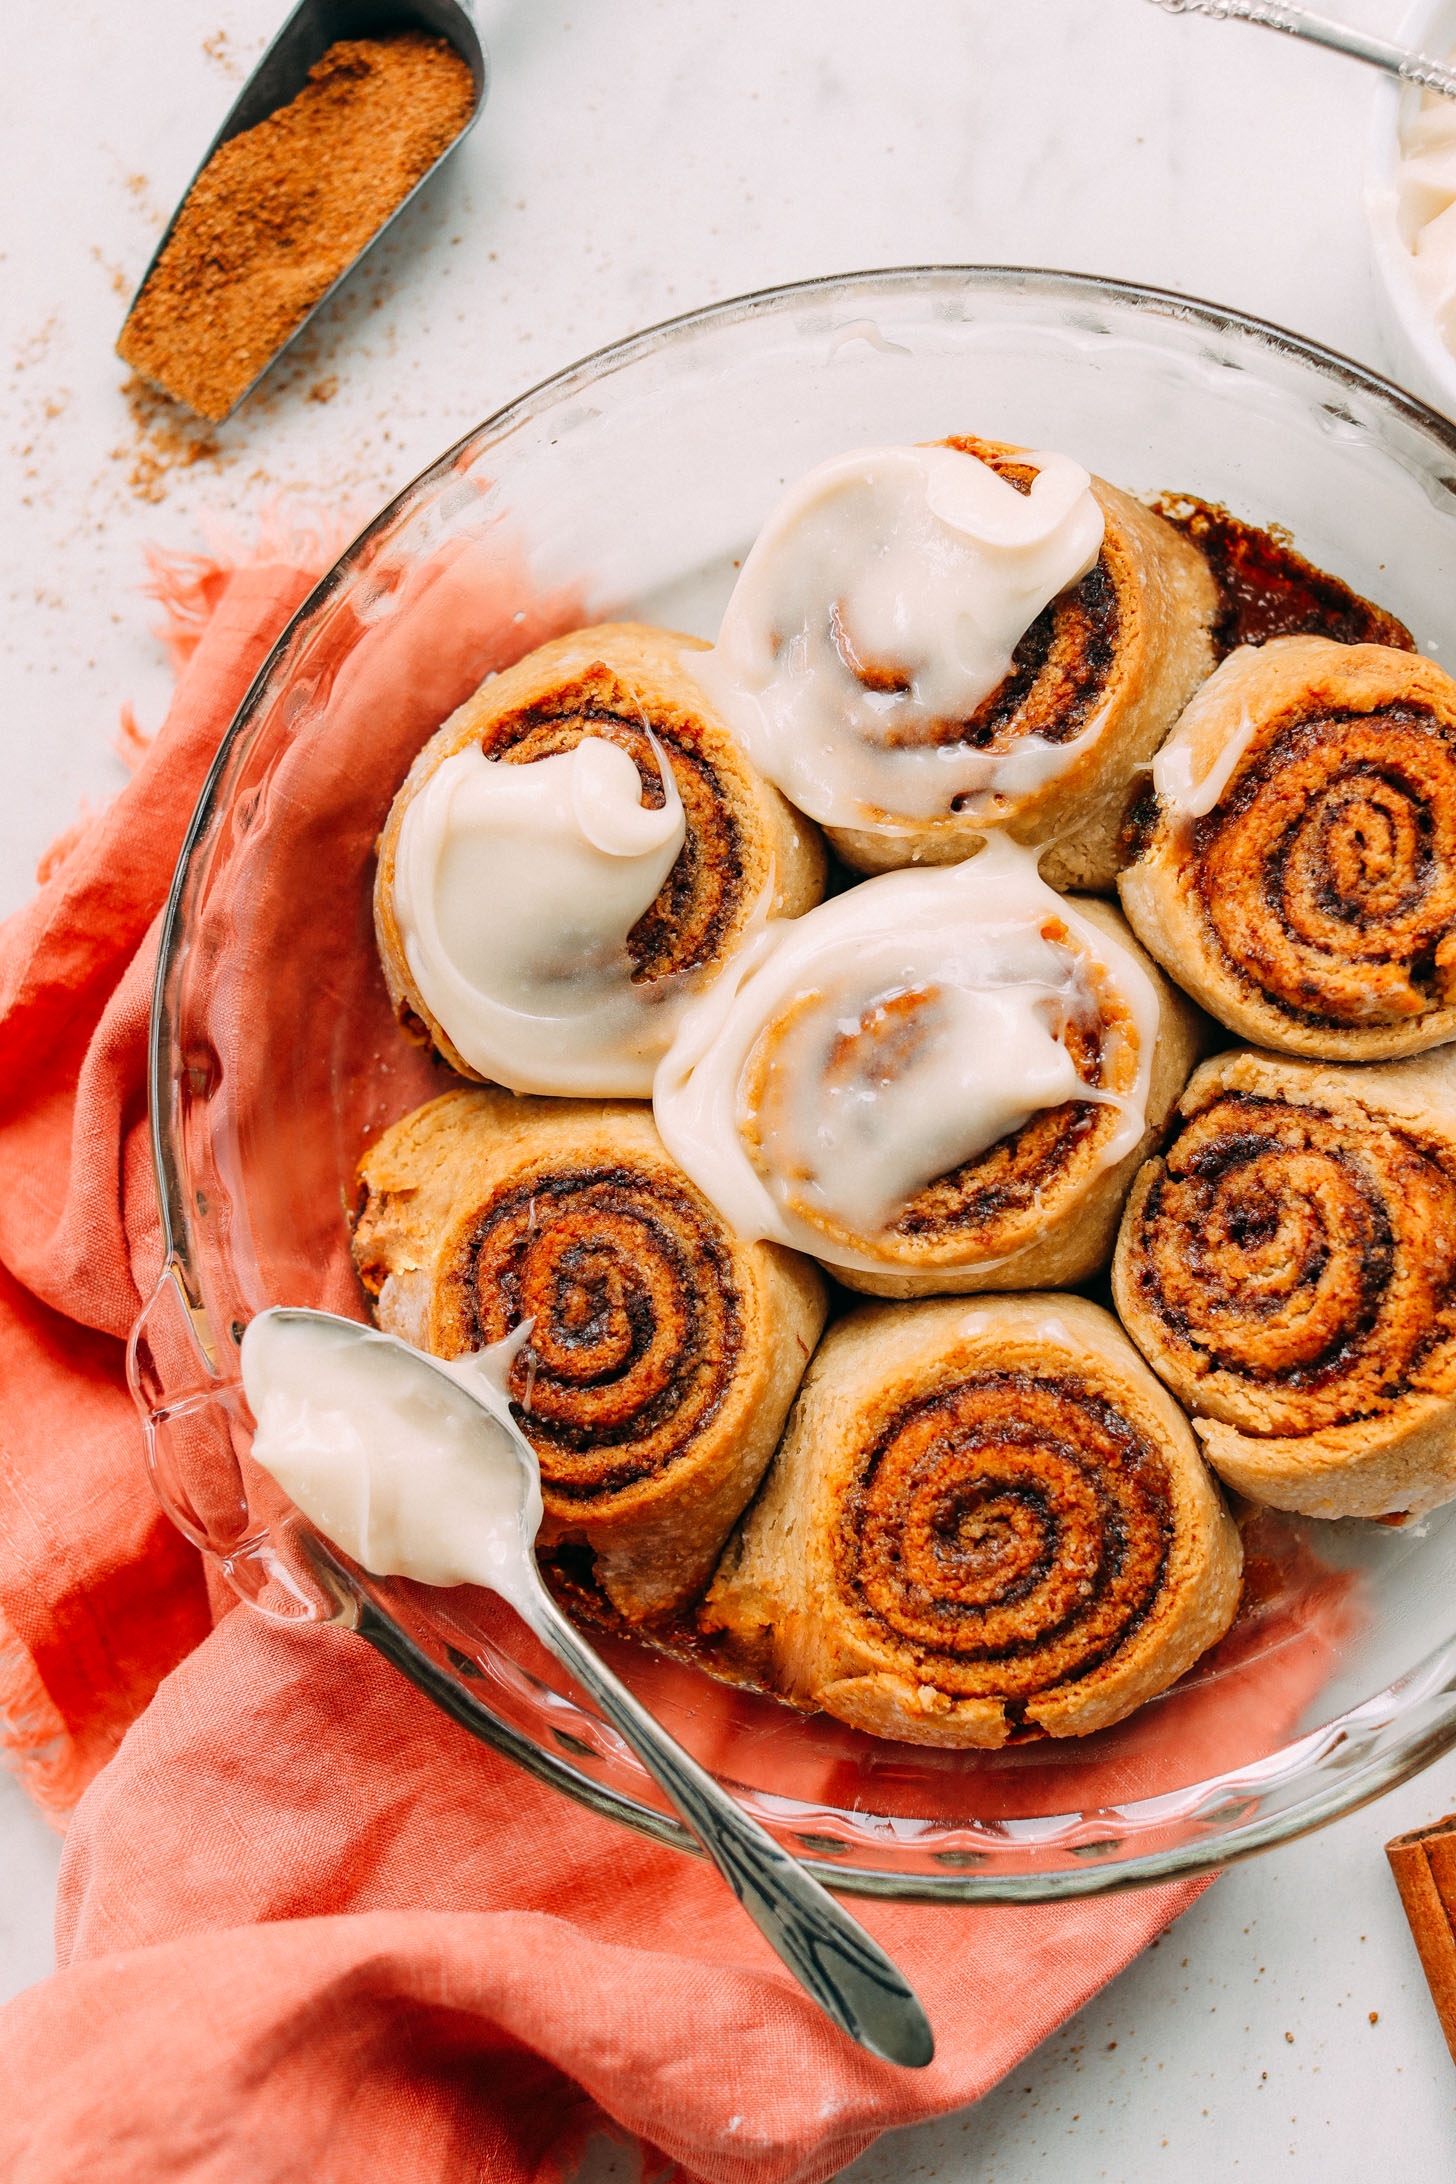 AMAZING Vegan Gluten-Free CINNAMON ROLLS! 10 ingredients, simple methods, SO tender and delicious! #vegan #plantbased #dessert #cinnamonrolls #recipe #glutenfree #minimalistbaker